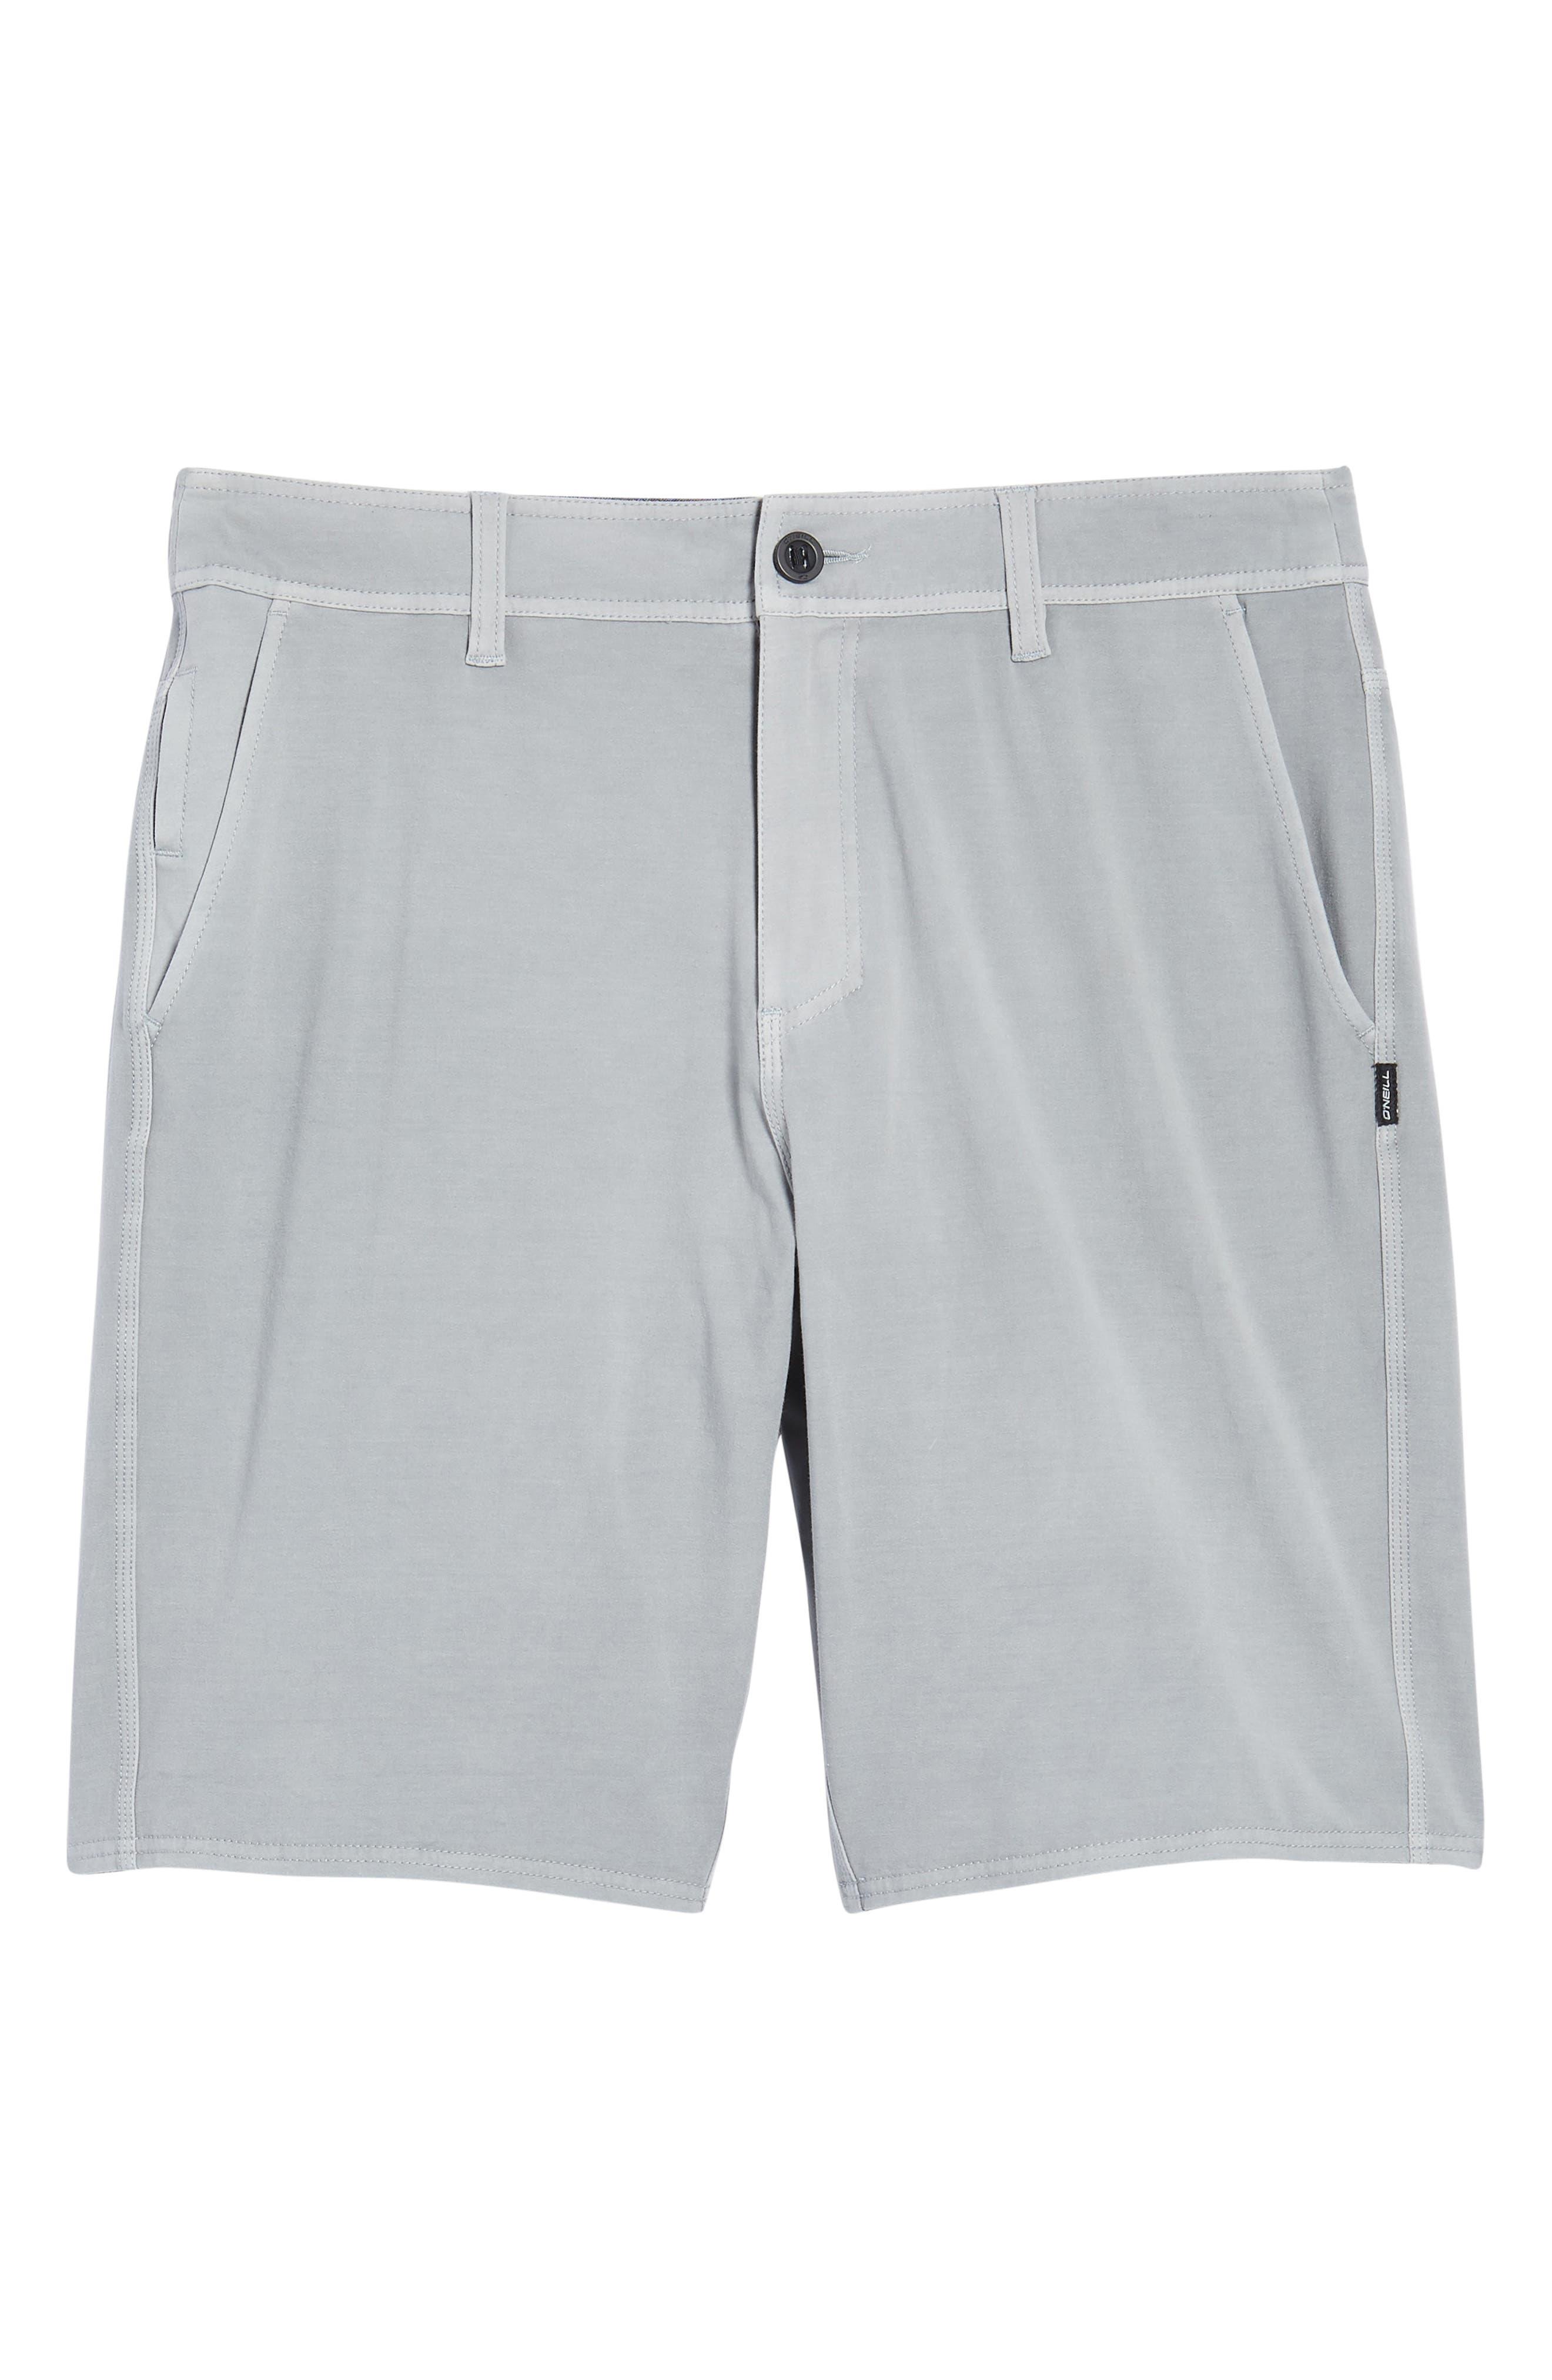 Venture Overdye Hybrid Shorts,                             Alternate thumbnail 6, color,                             039